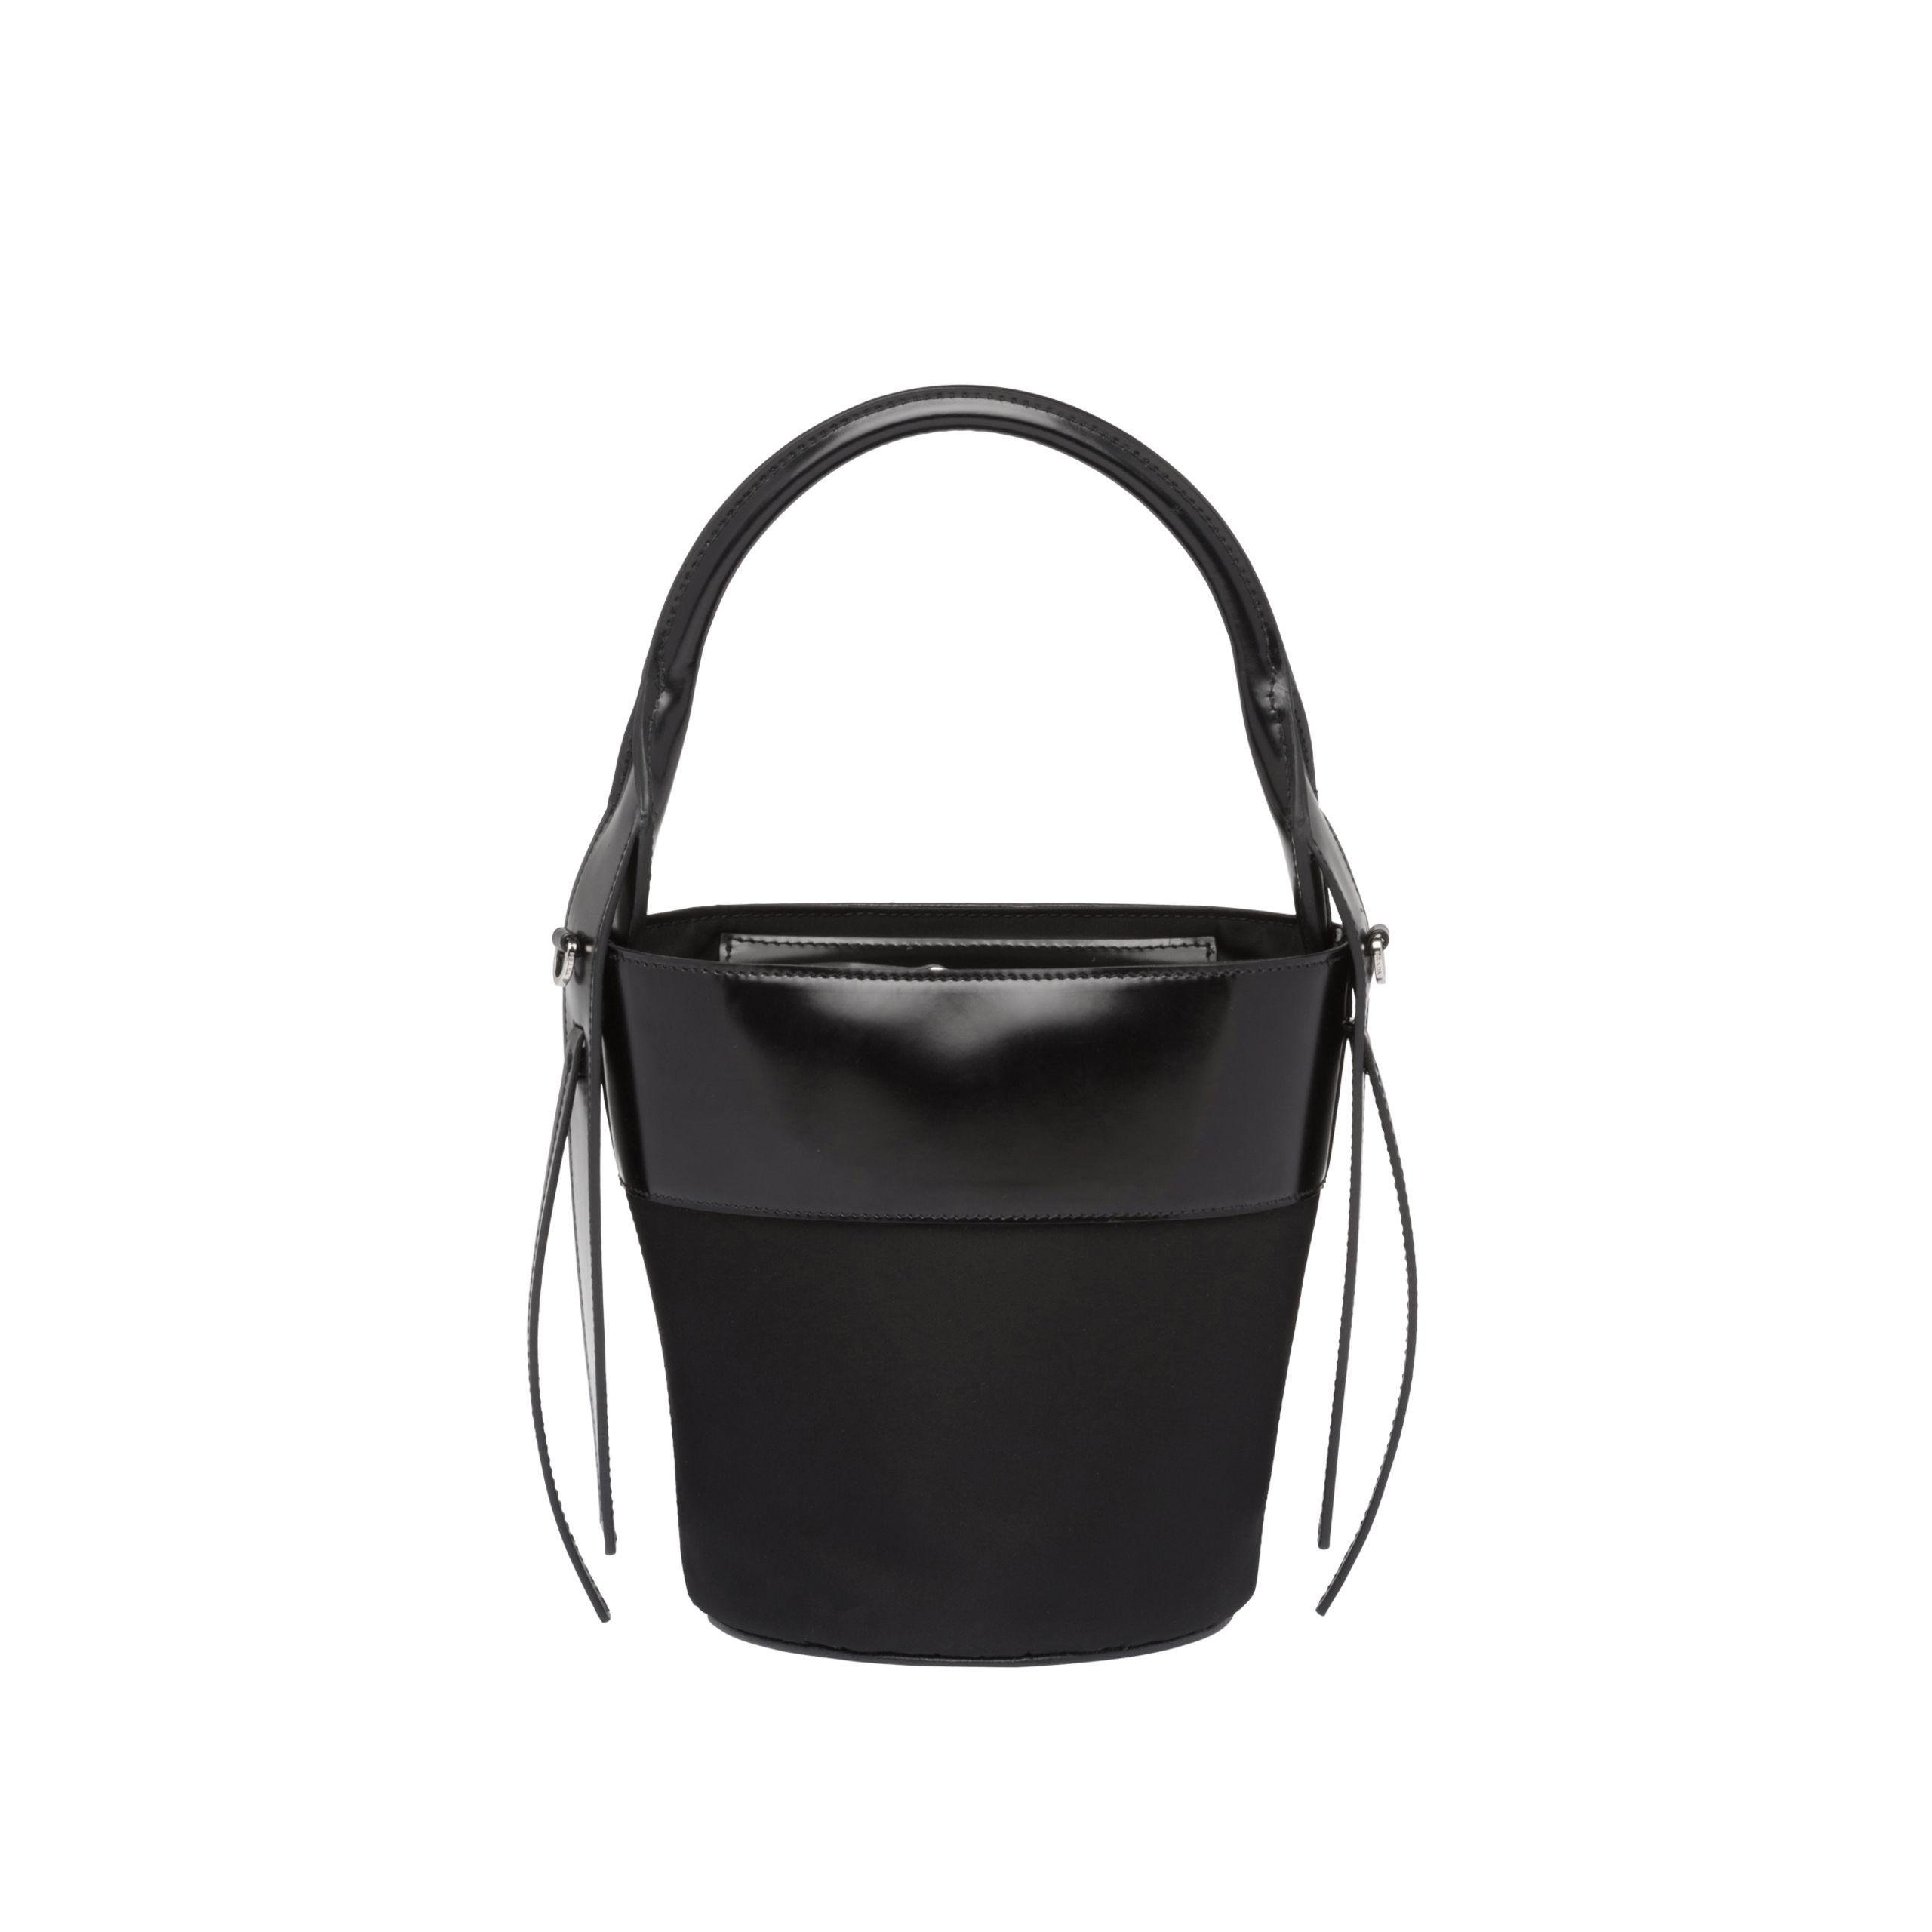 1c61b45c53 Lyst - Prada Ouverture Nylon Bucket Bag in Black